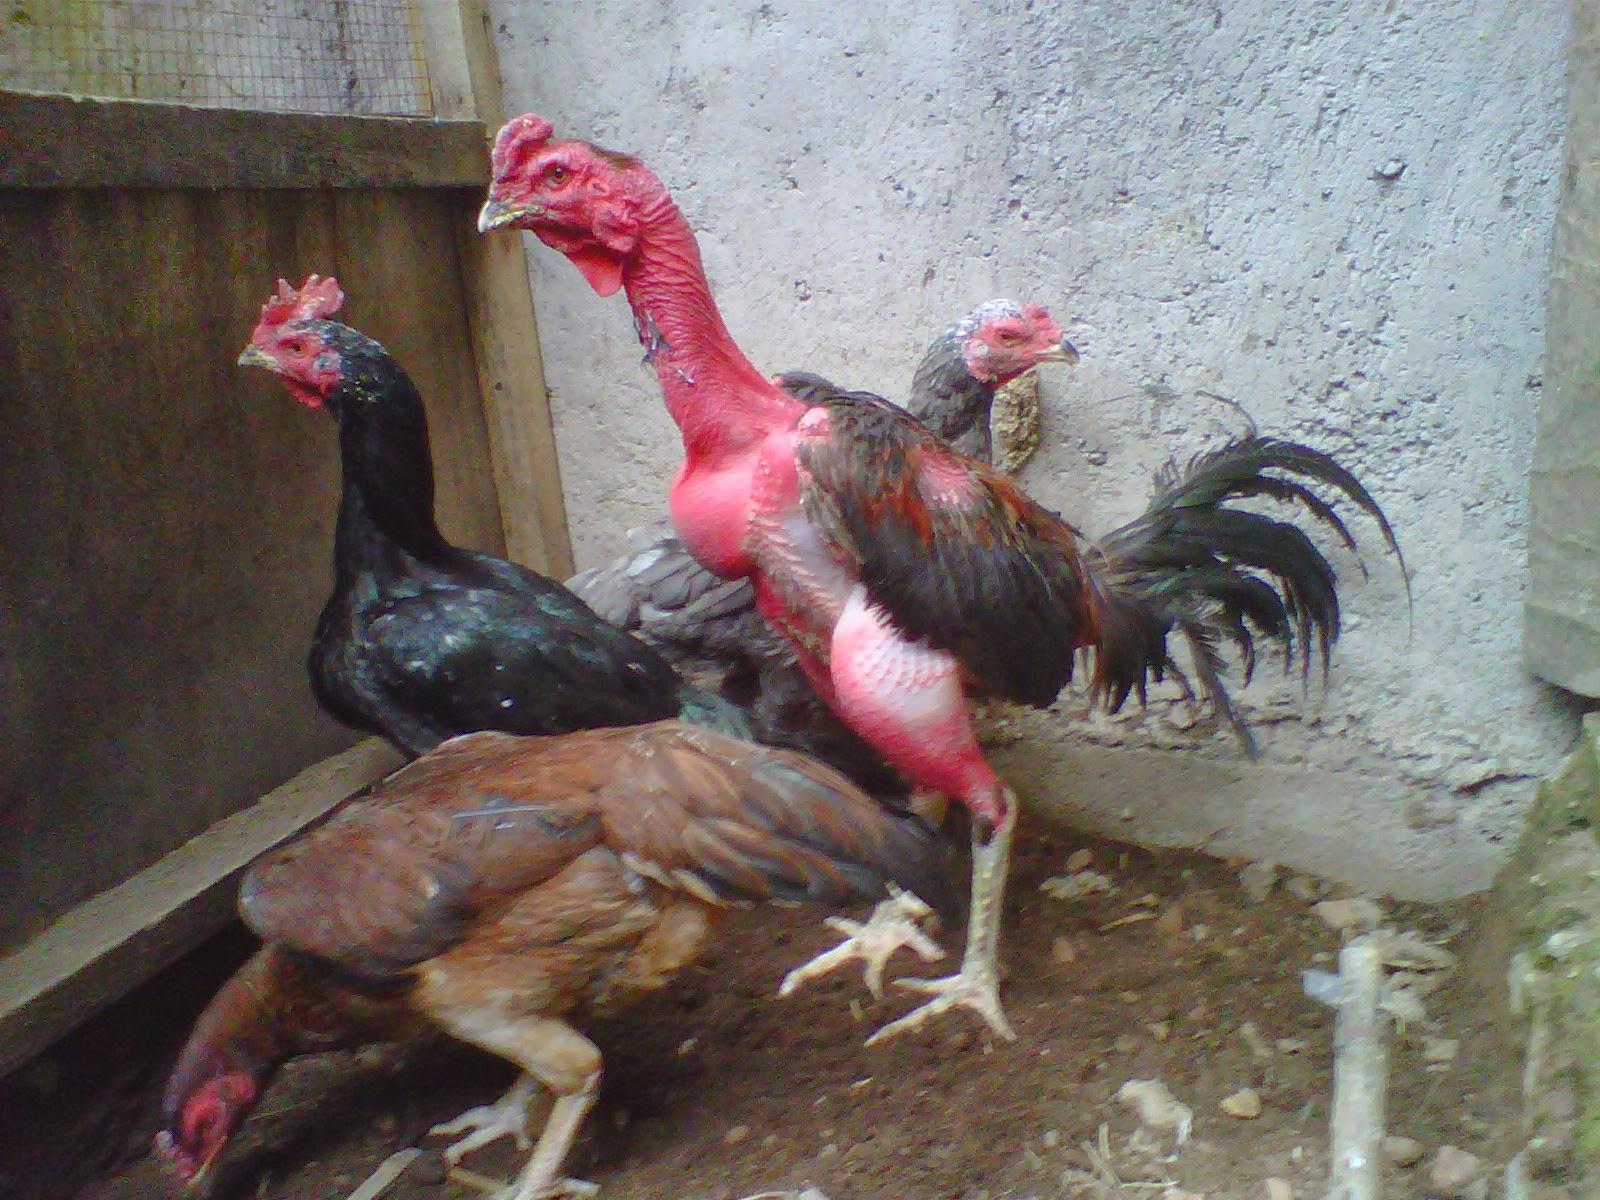 foto hewan - gambar ayam bangkok umur 3 bulan